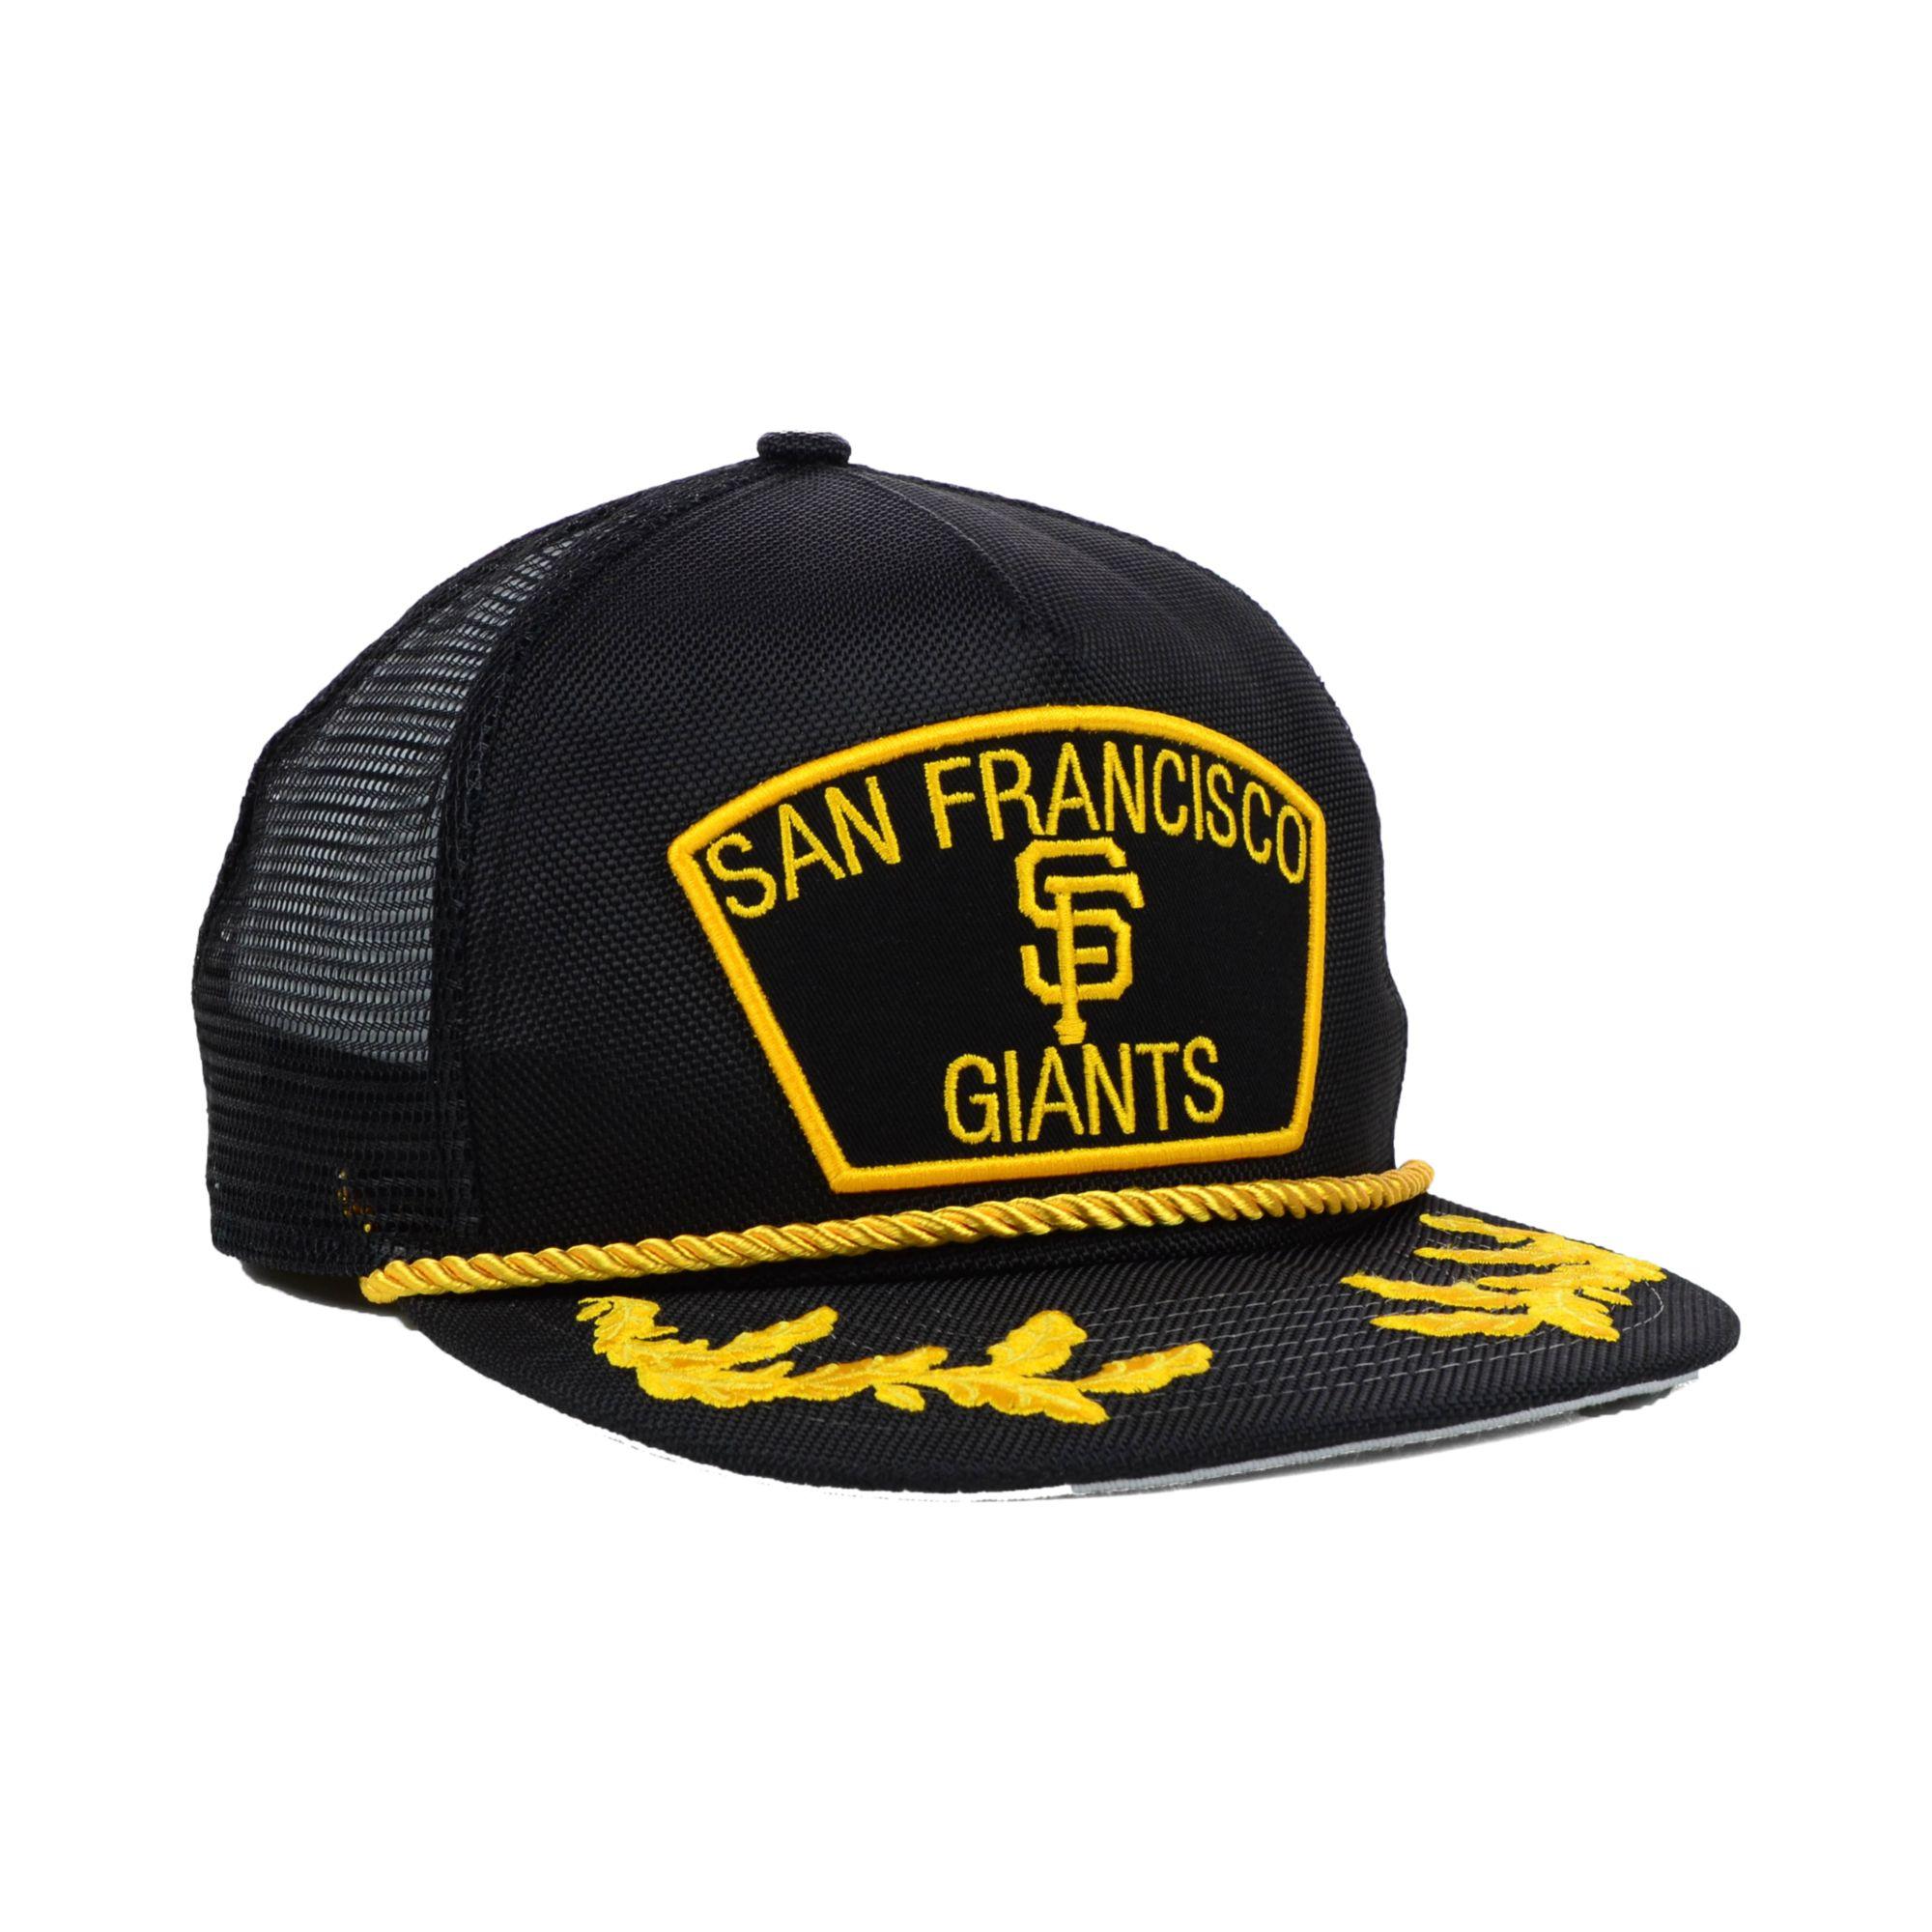 a2d28d2f57a ... italy lyst ktz san francisco giants mlb 9fifty snapback cap in black  for men 1252d 81574